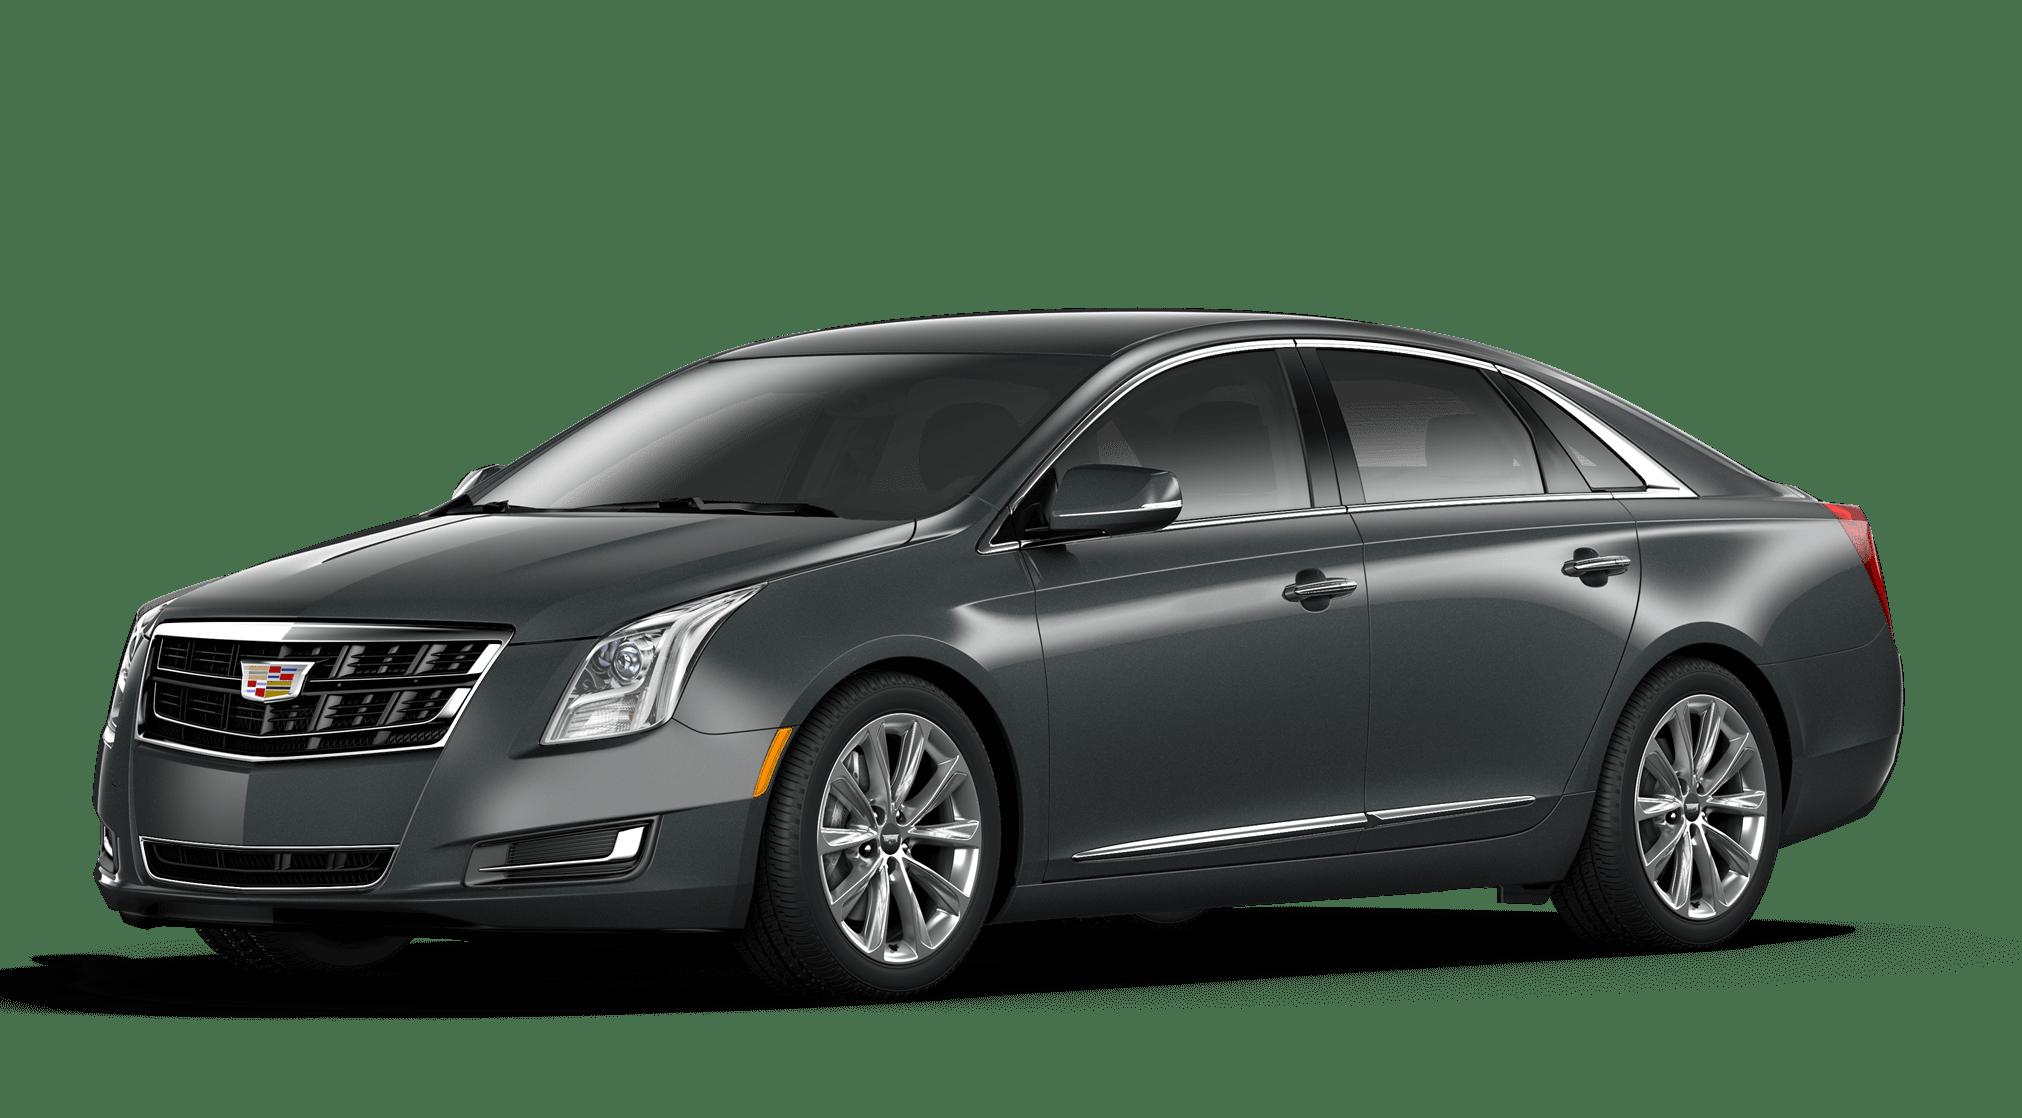 2016 Cadillac XTS Graphite Metallic